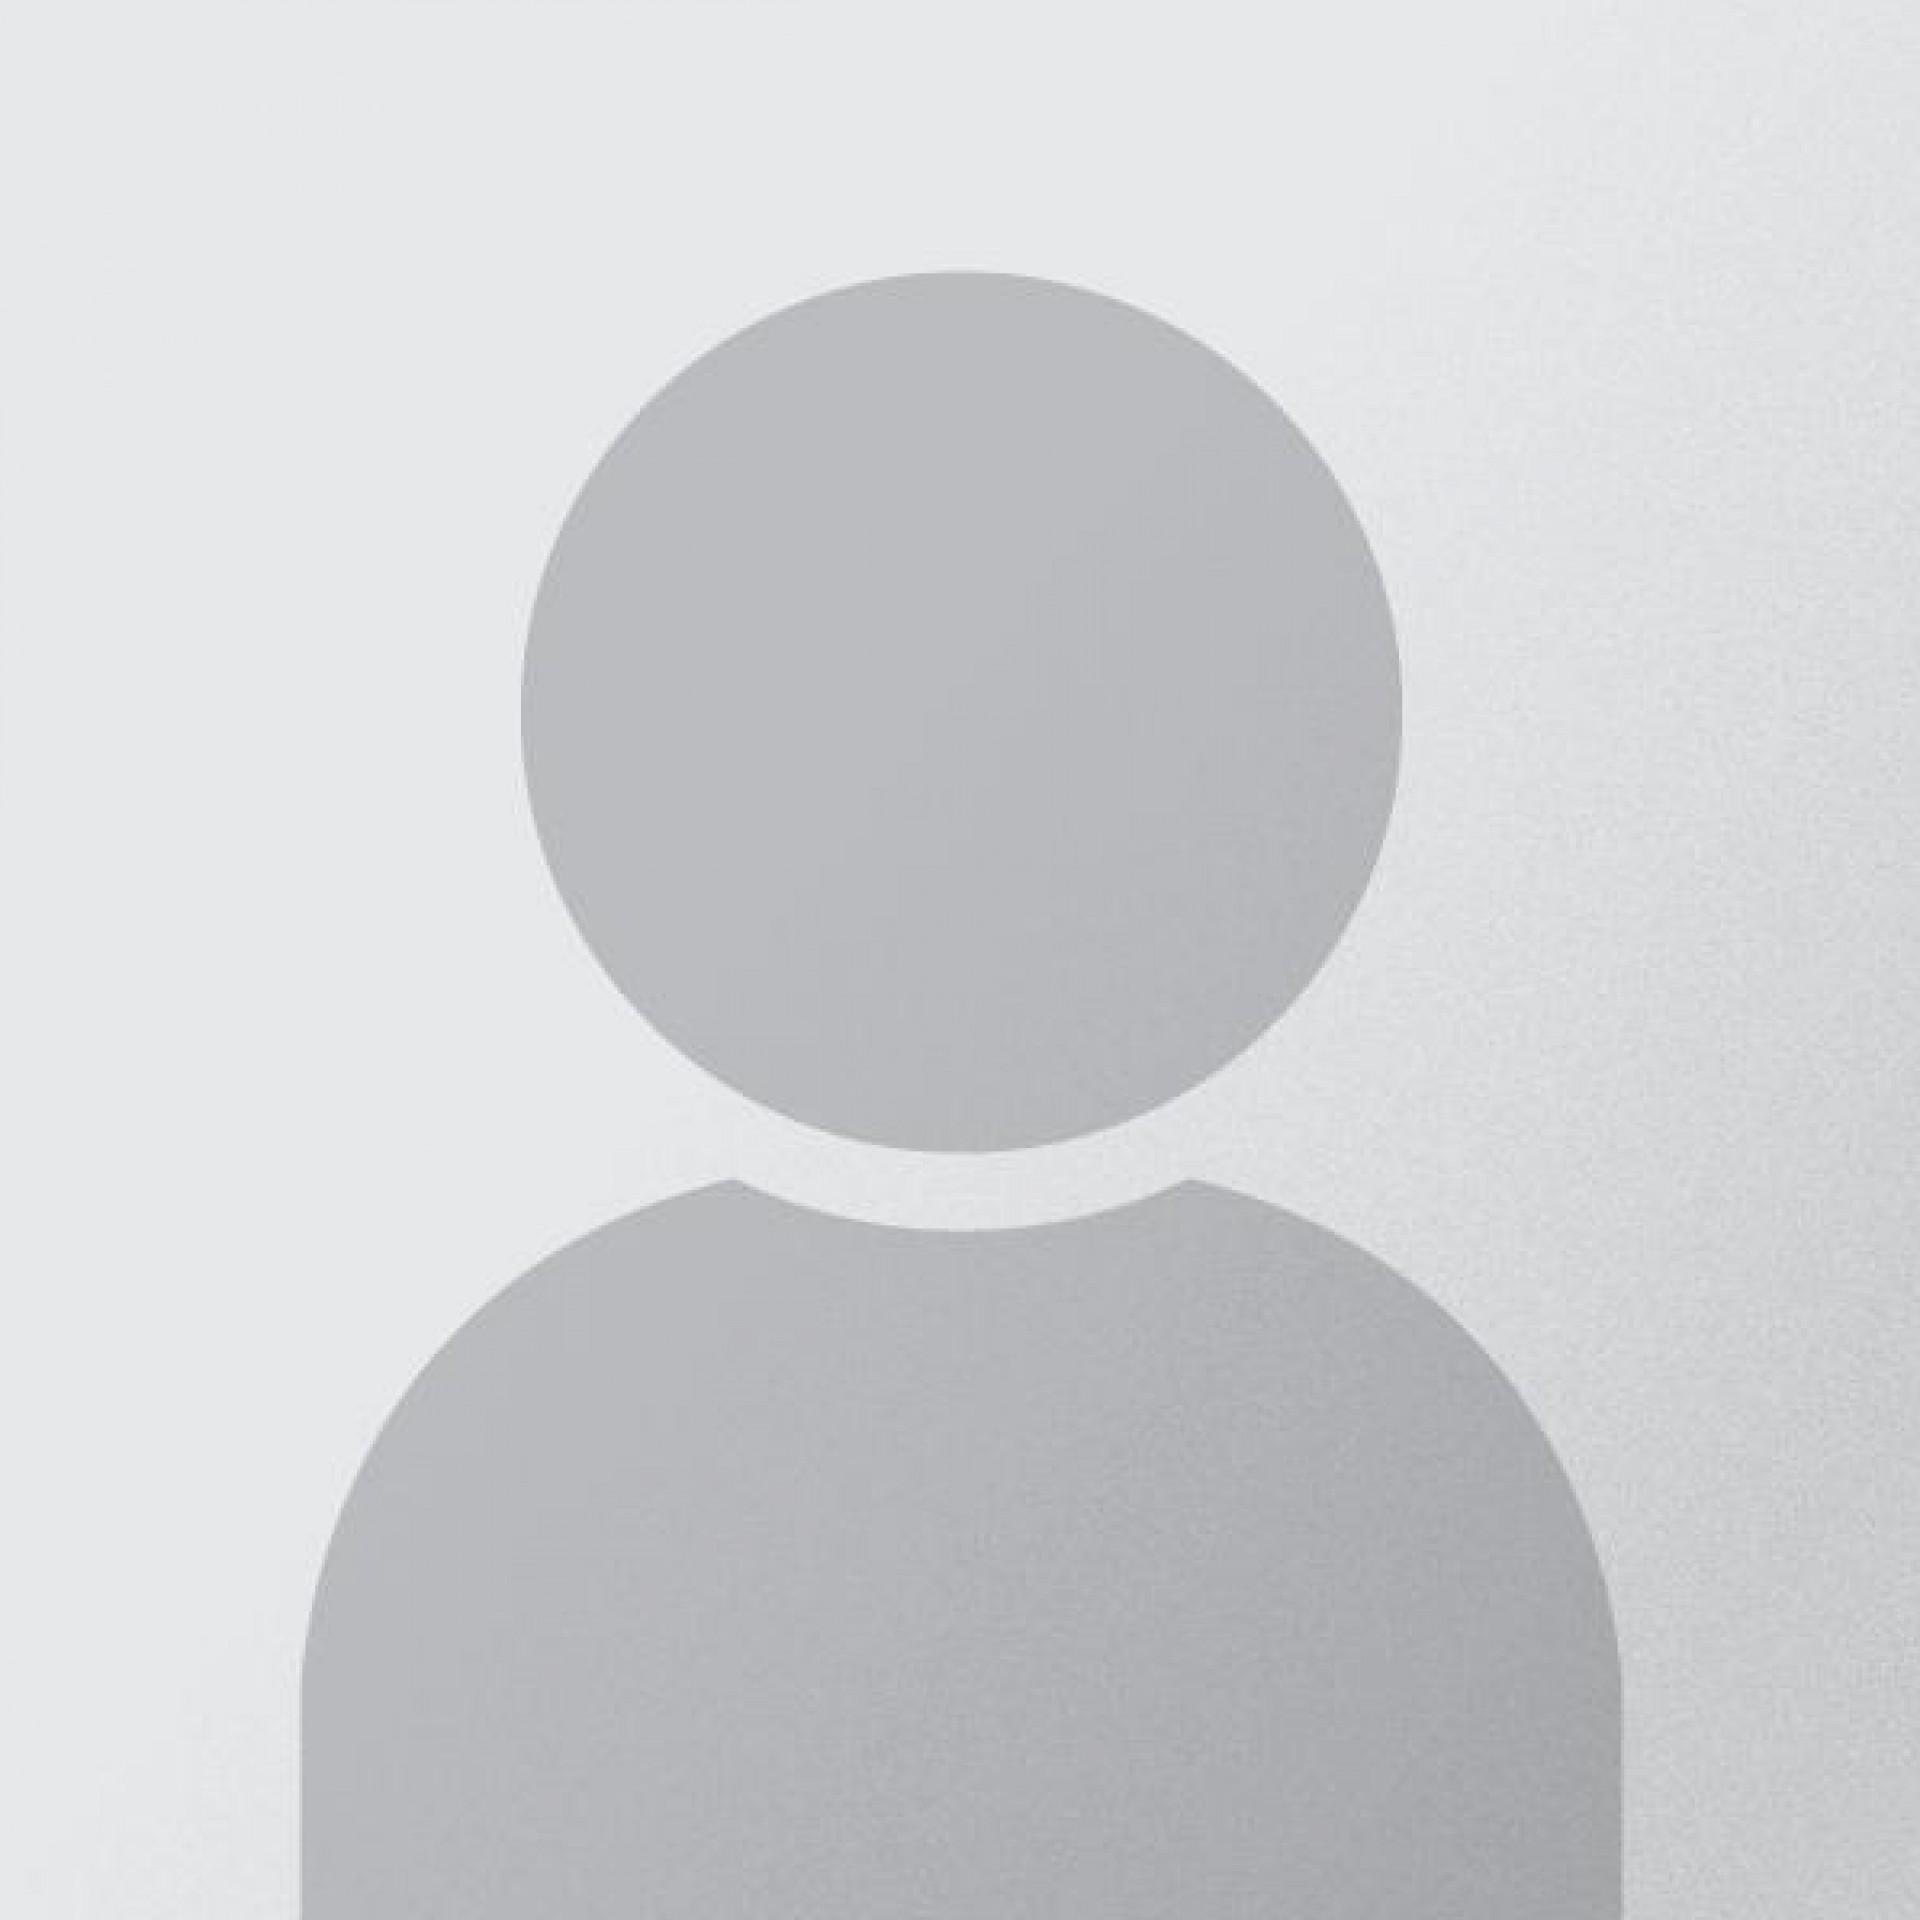 fotografia p021 profilu 01023GI45Z